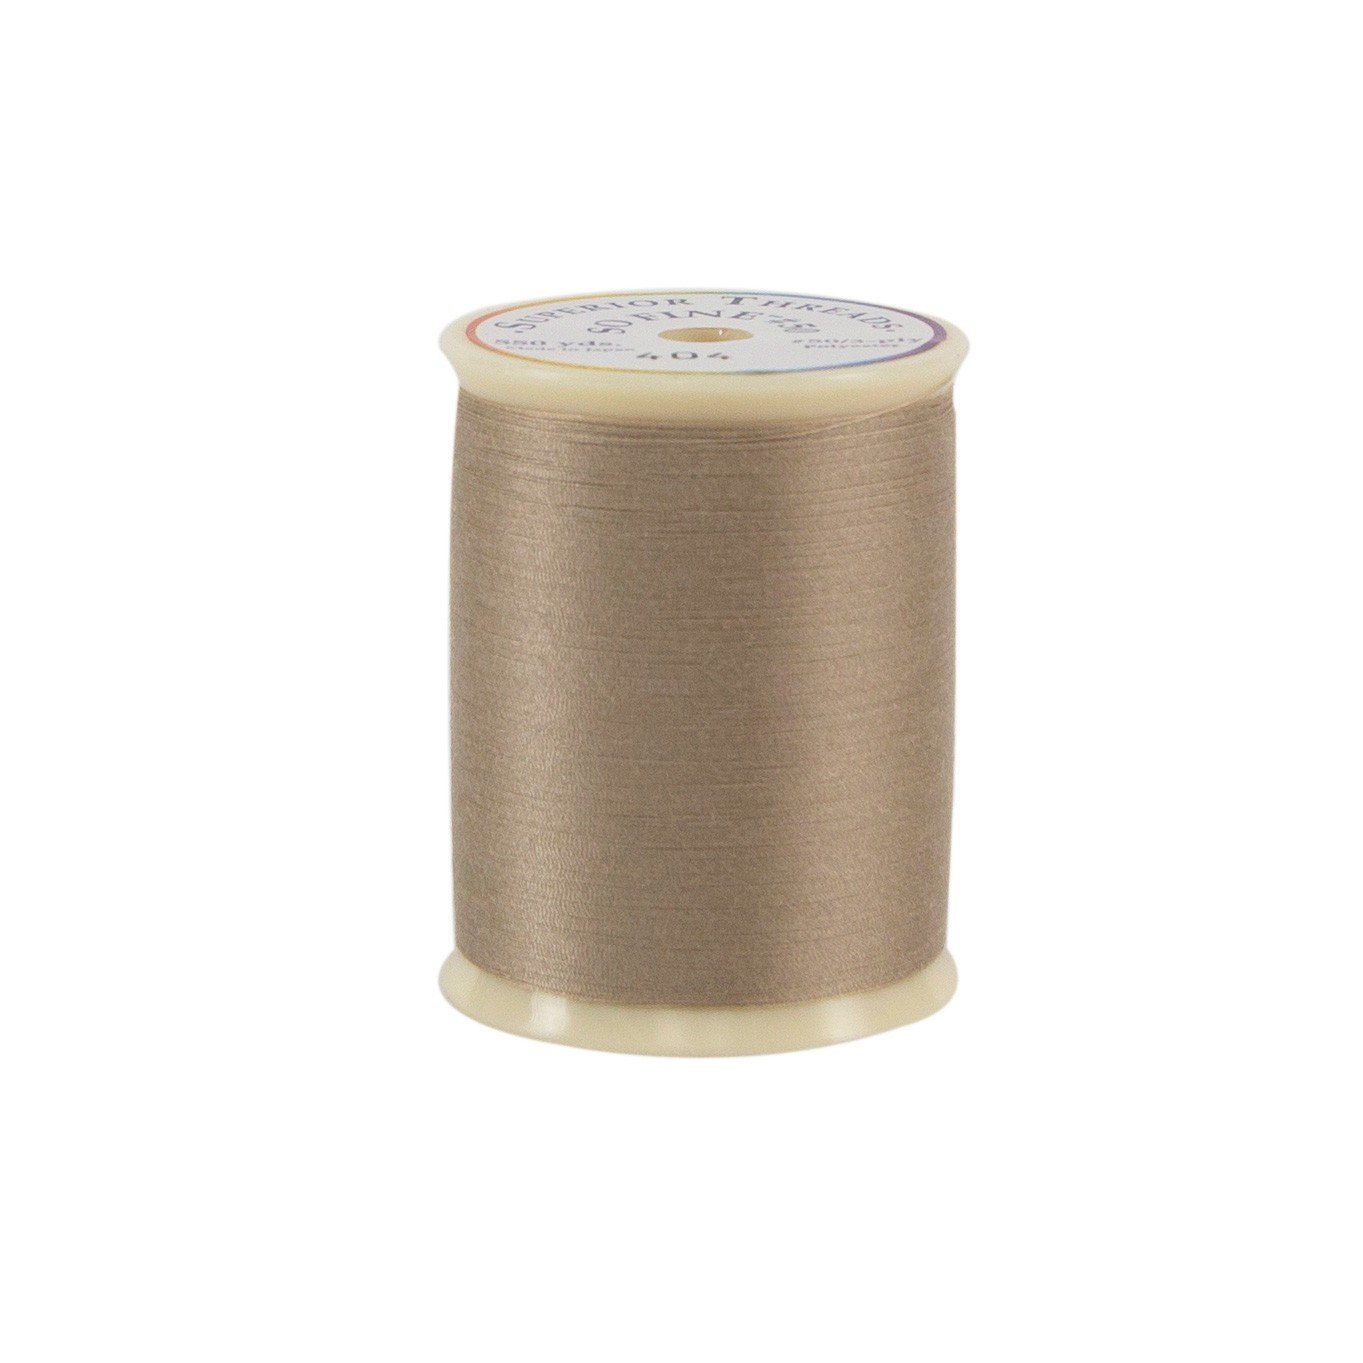 Superior Threads 11601A-437 So Fine Teal 3-Ply 50W Polyester Thread 550 yd